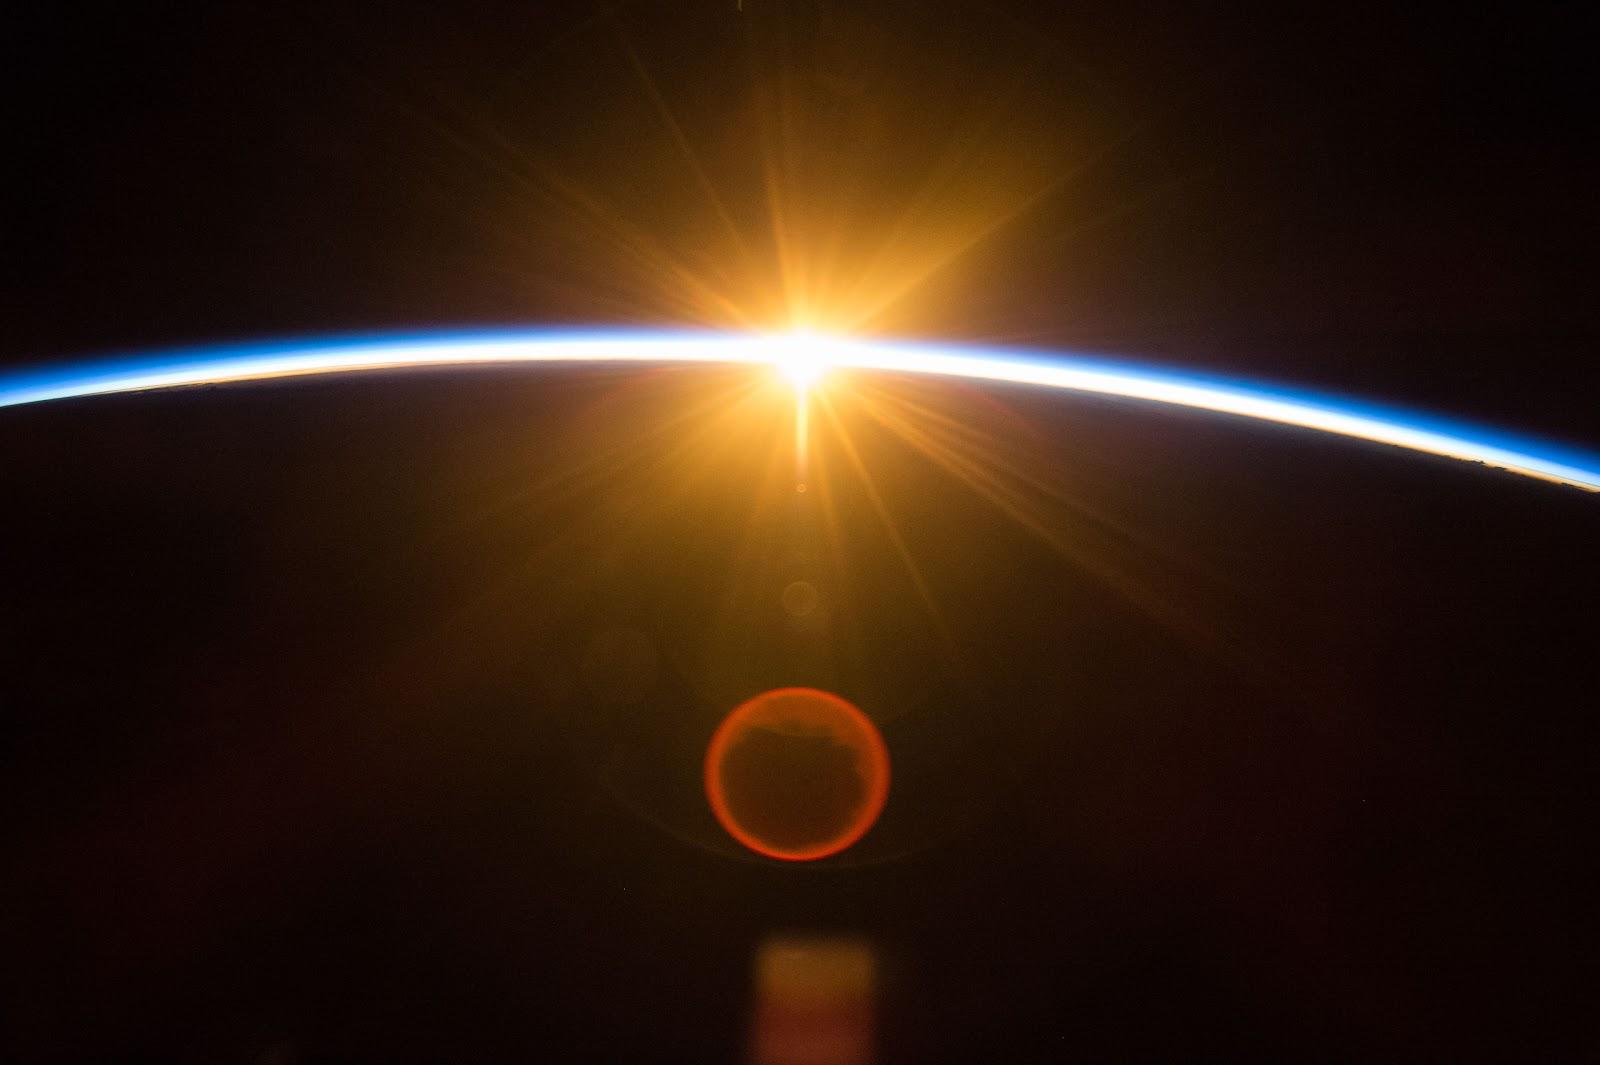 sunrise from international space station - photo #6